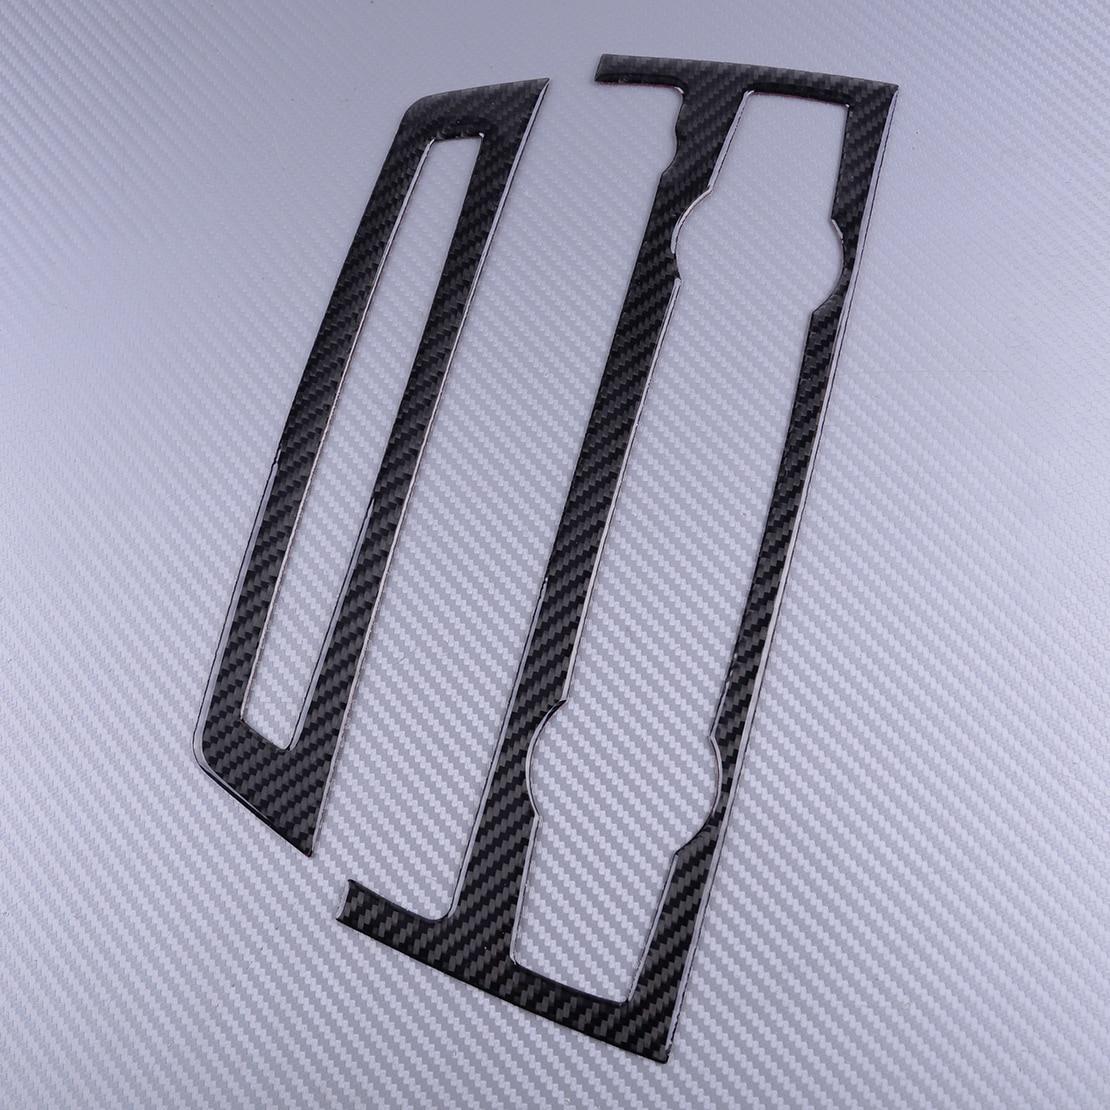 Panel embellecedor de cubierta de CD de aire acondicionado de consola de coche negro de fibra de carbono DWCX para BMW X5 E70 X6 E71 2008 2009 2010 2011 2012 2013